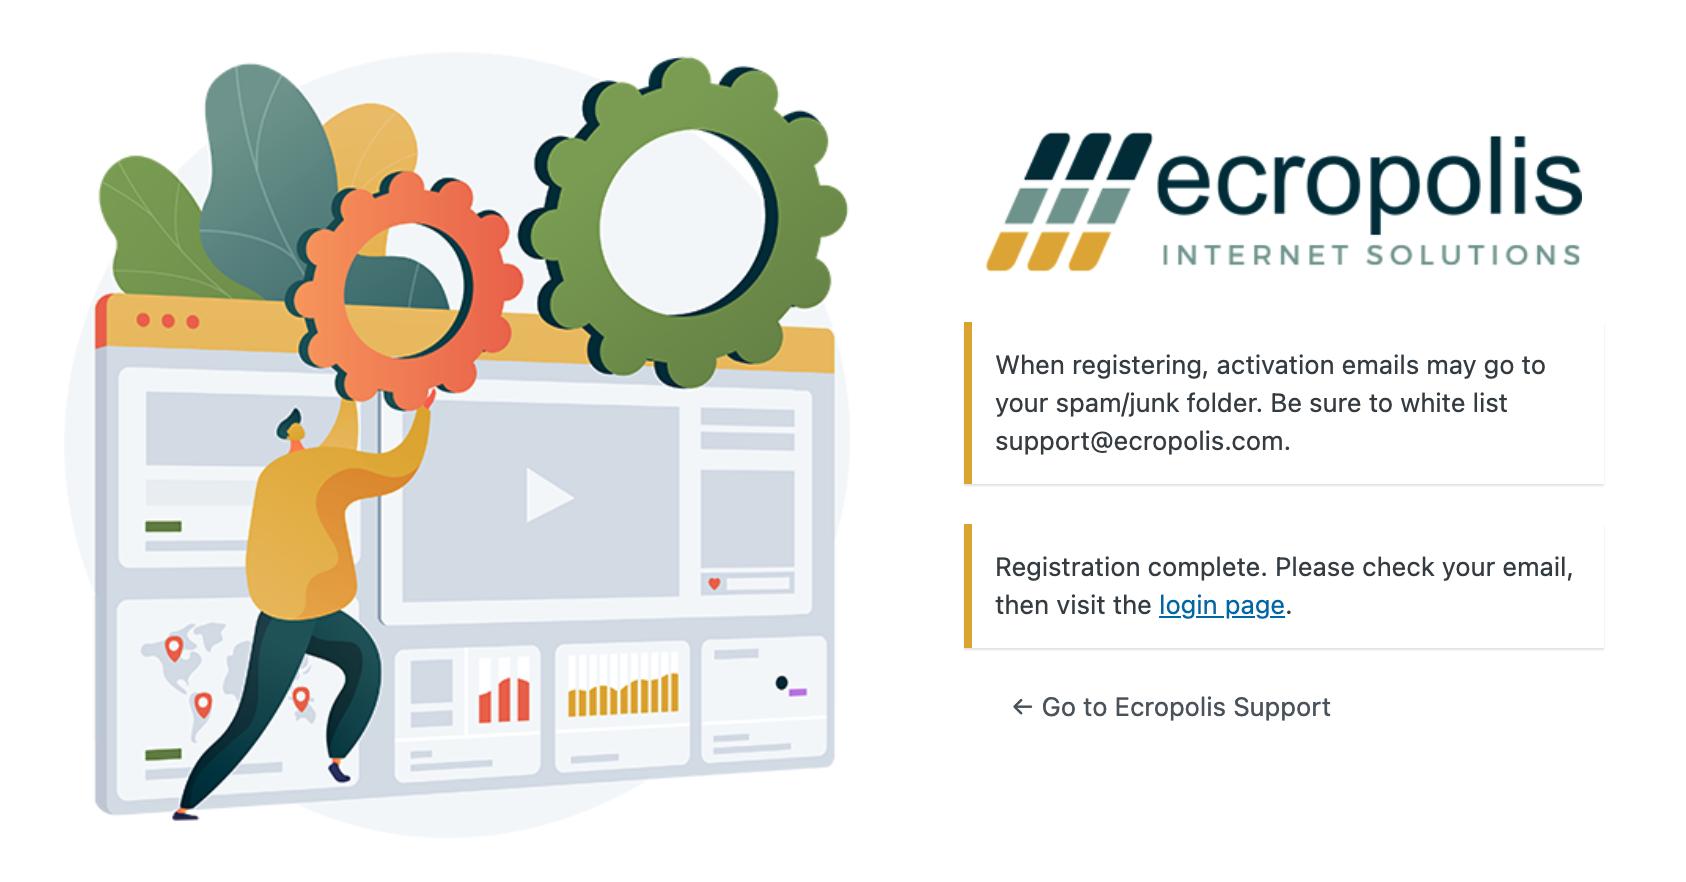 help-ecropolis-registration-complete